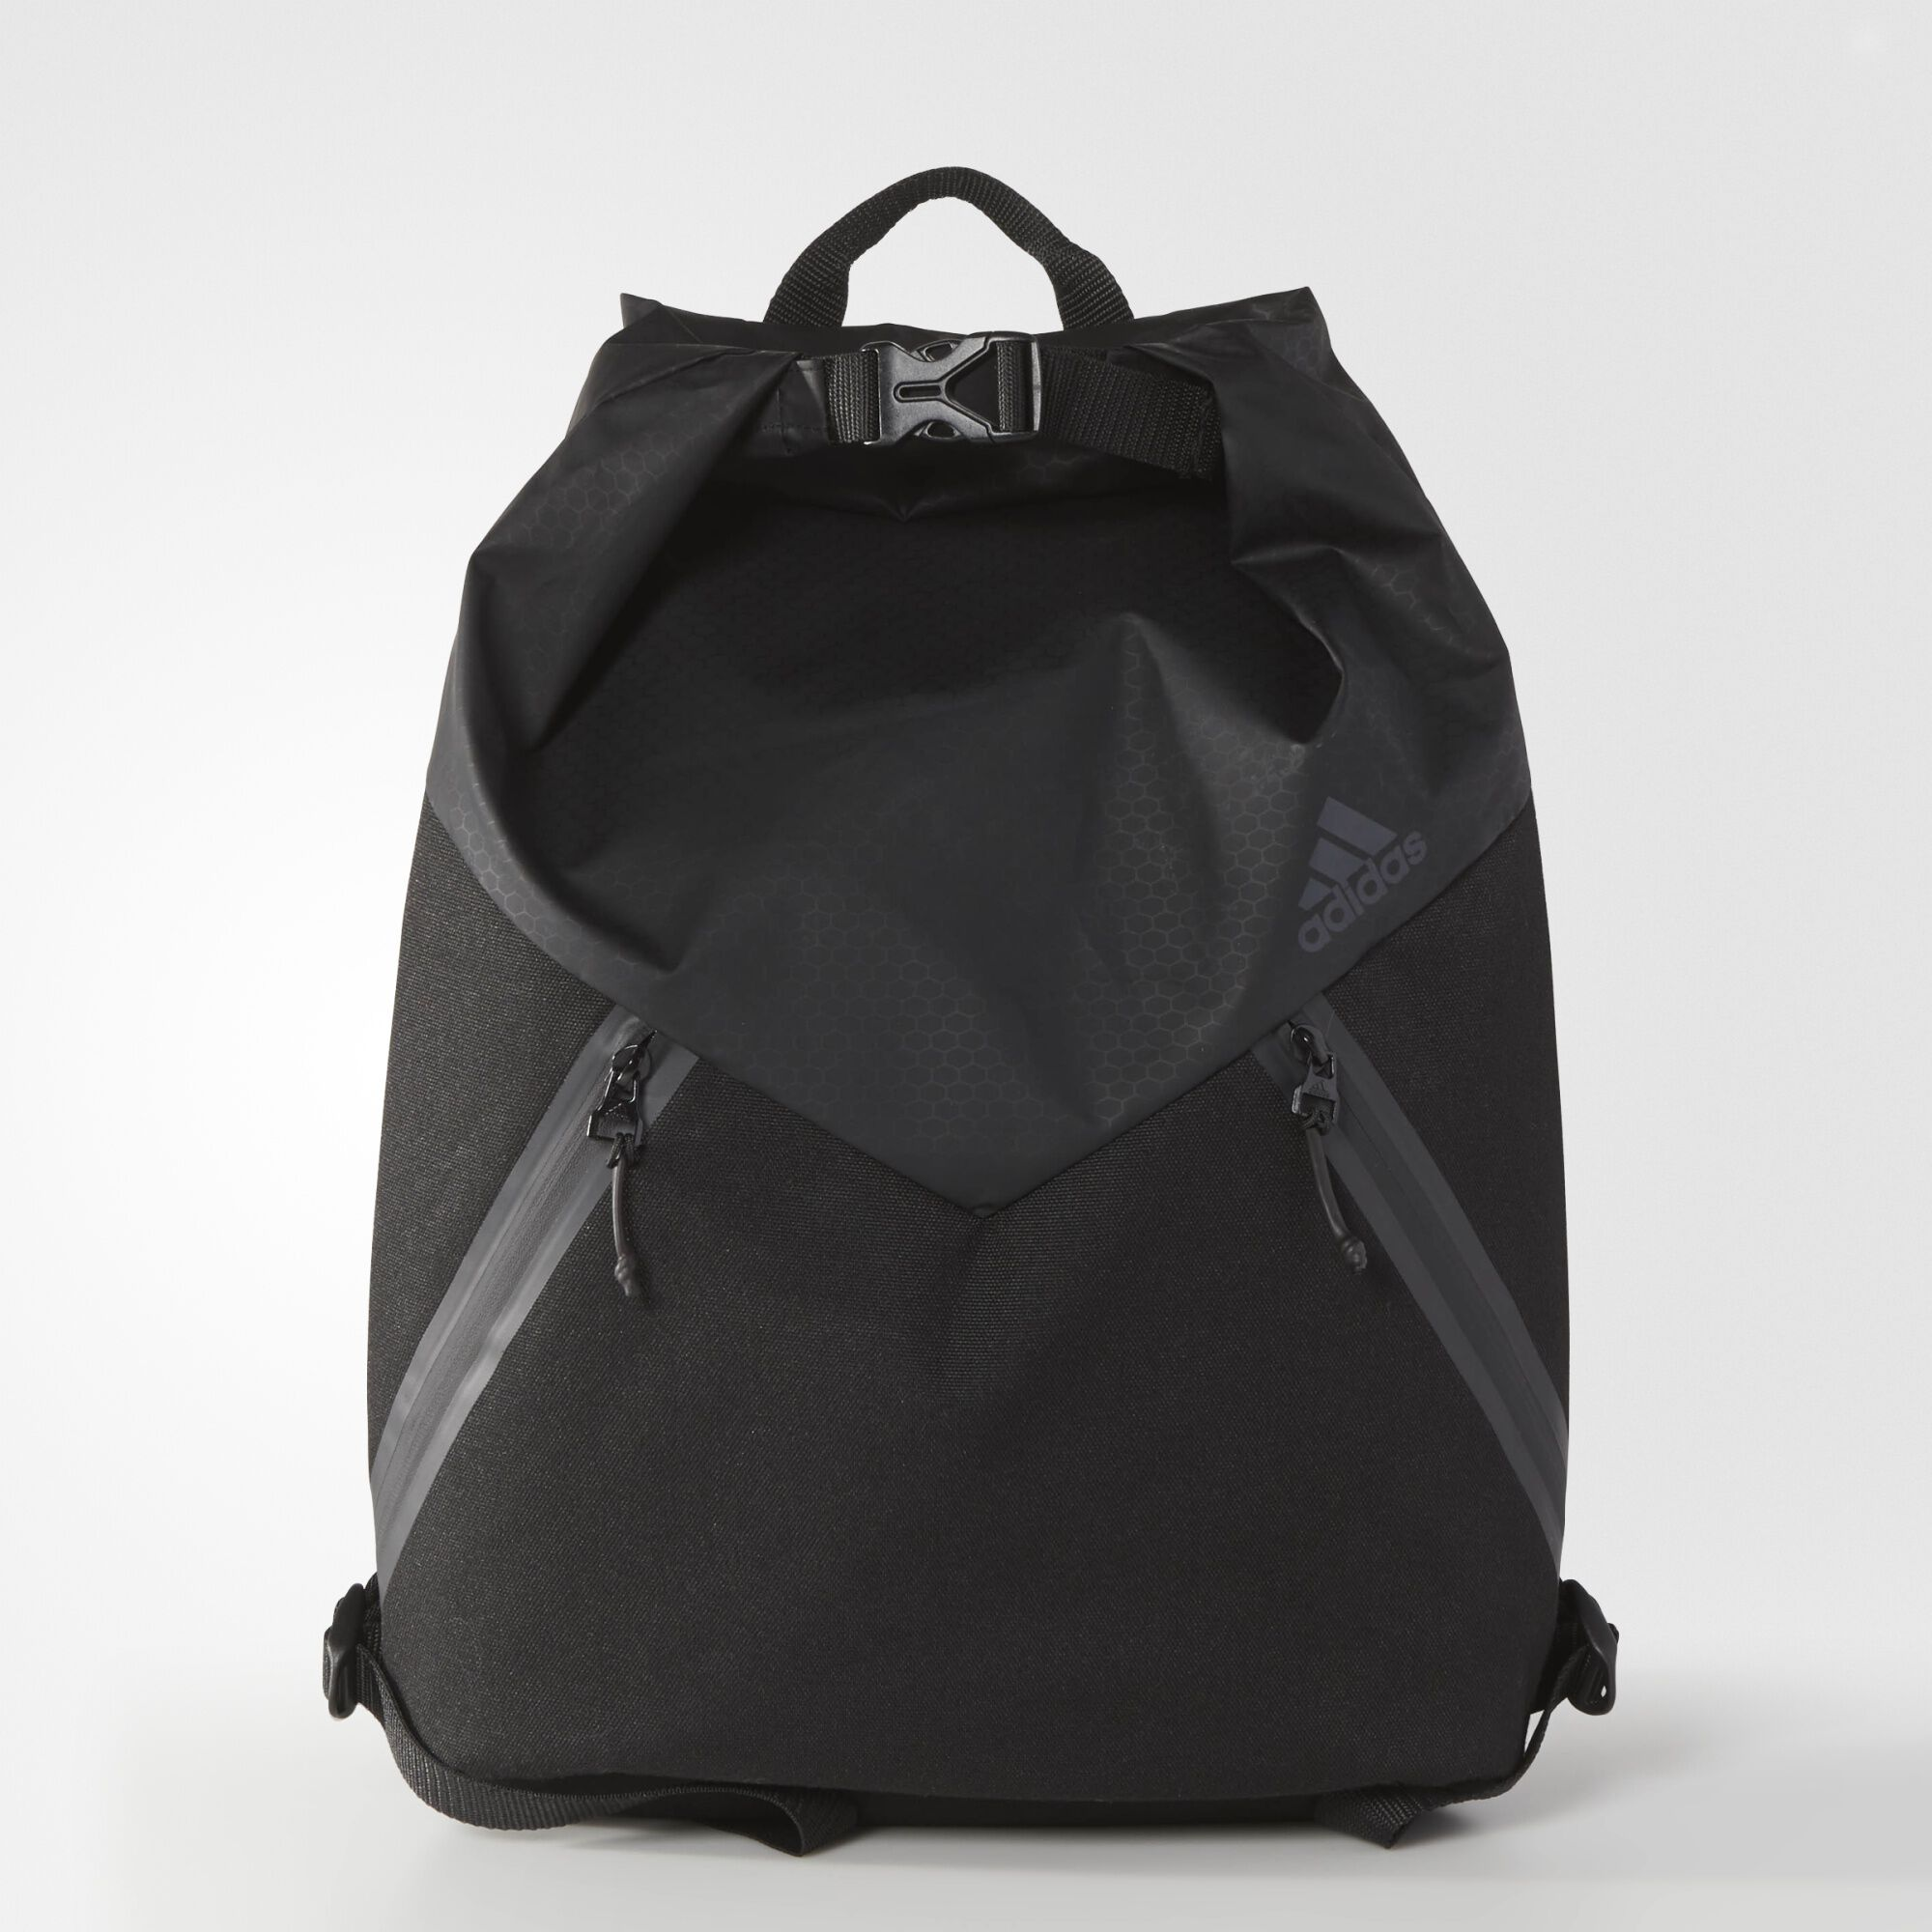 Buy adidas sackpack grey   OFF62% Discounted 8ec0ada83cb9e